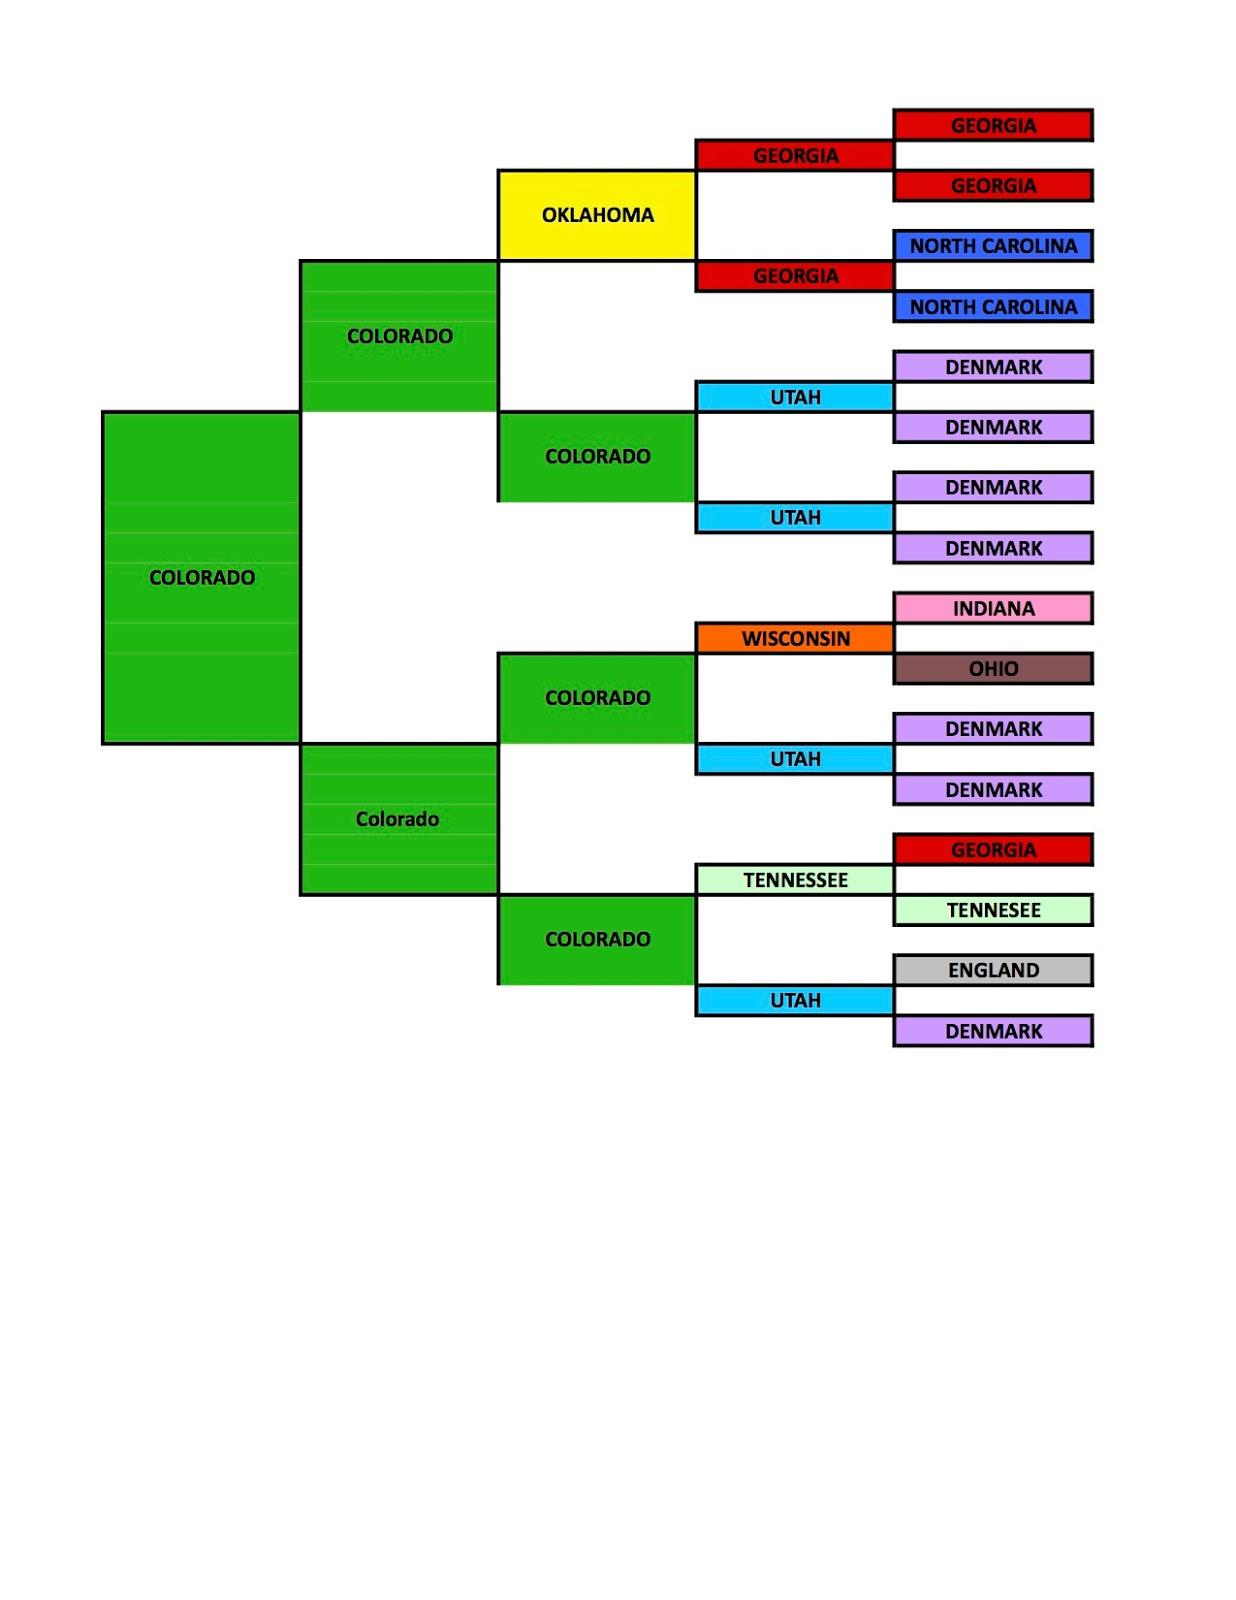 A southern sleuth birthplace pedigree chart mycolorfulancestry j paul hawthorne geneaspy genealogy ancestry mycolorfulancestry pooptronica Gallery